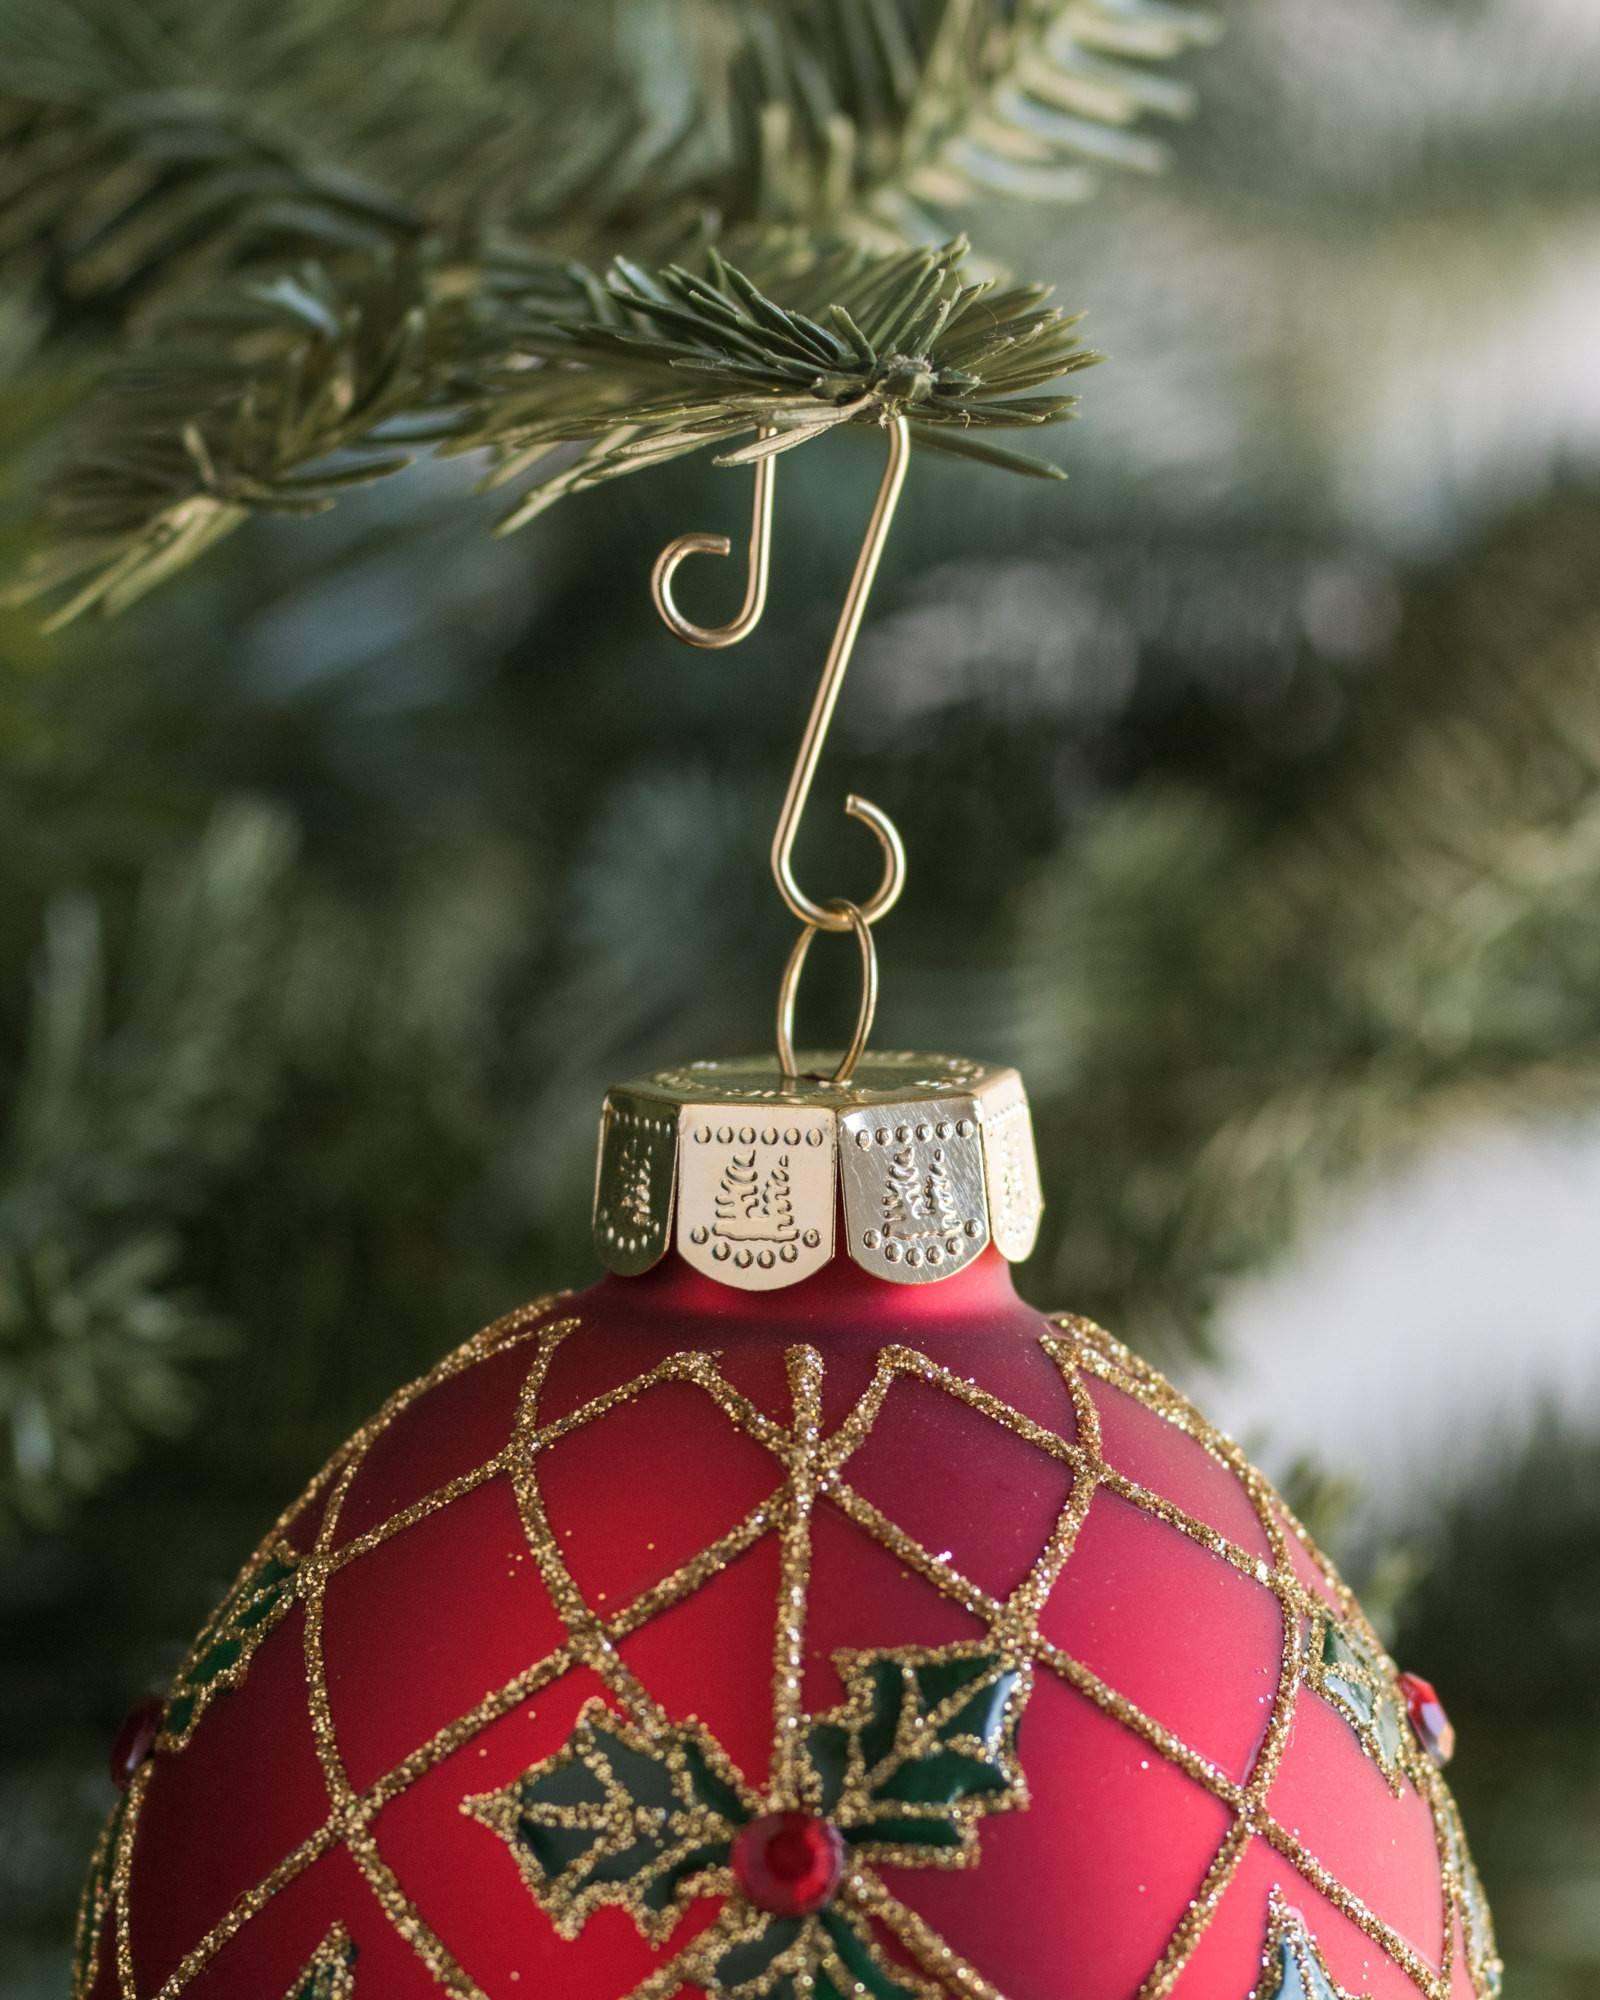 Heavy duty ornament hooks -  Gold Ornament Hooks Set Of 100 Alt